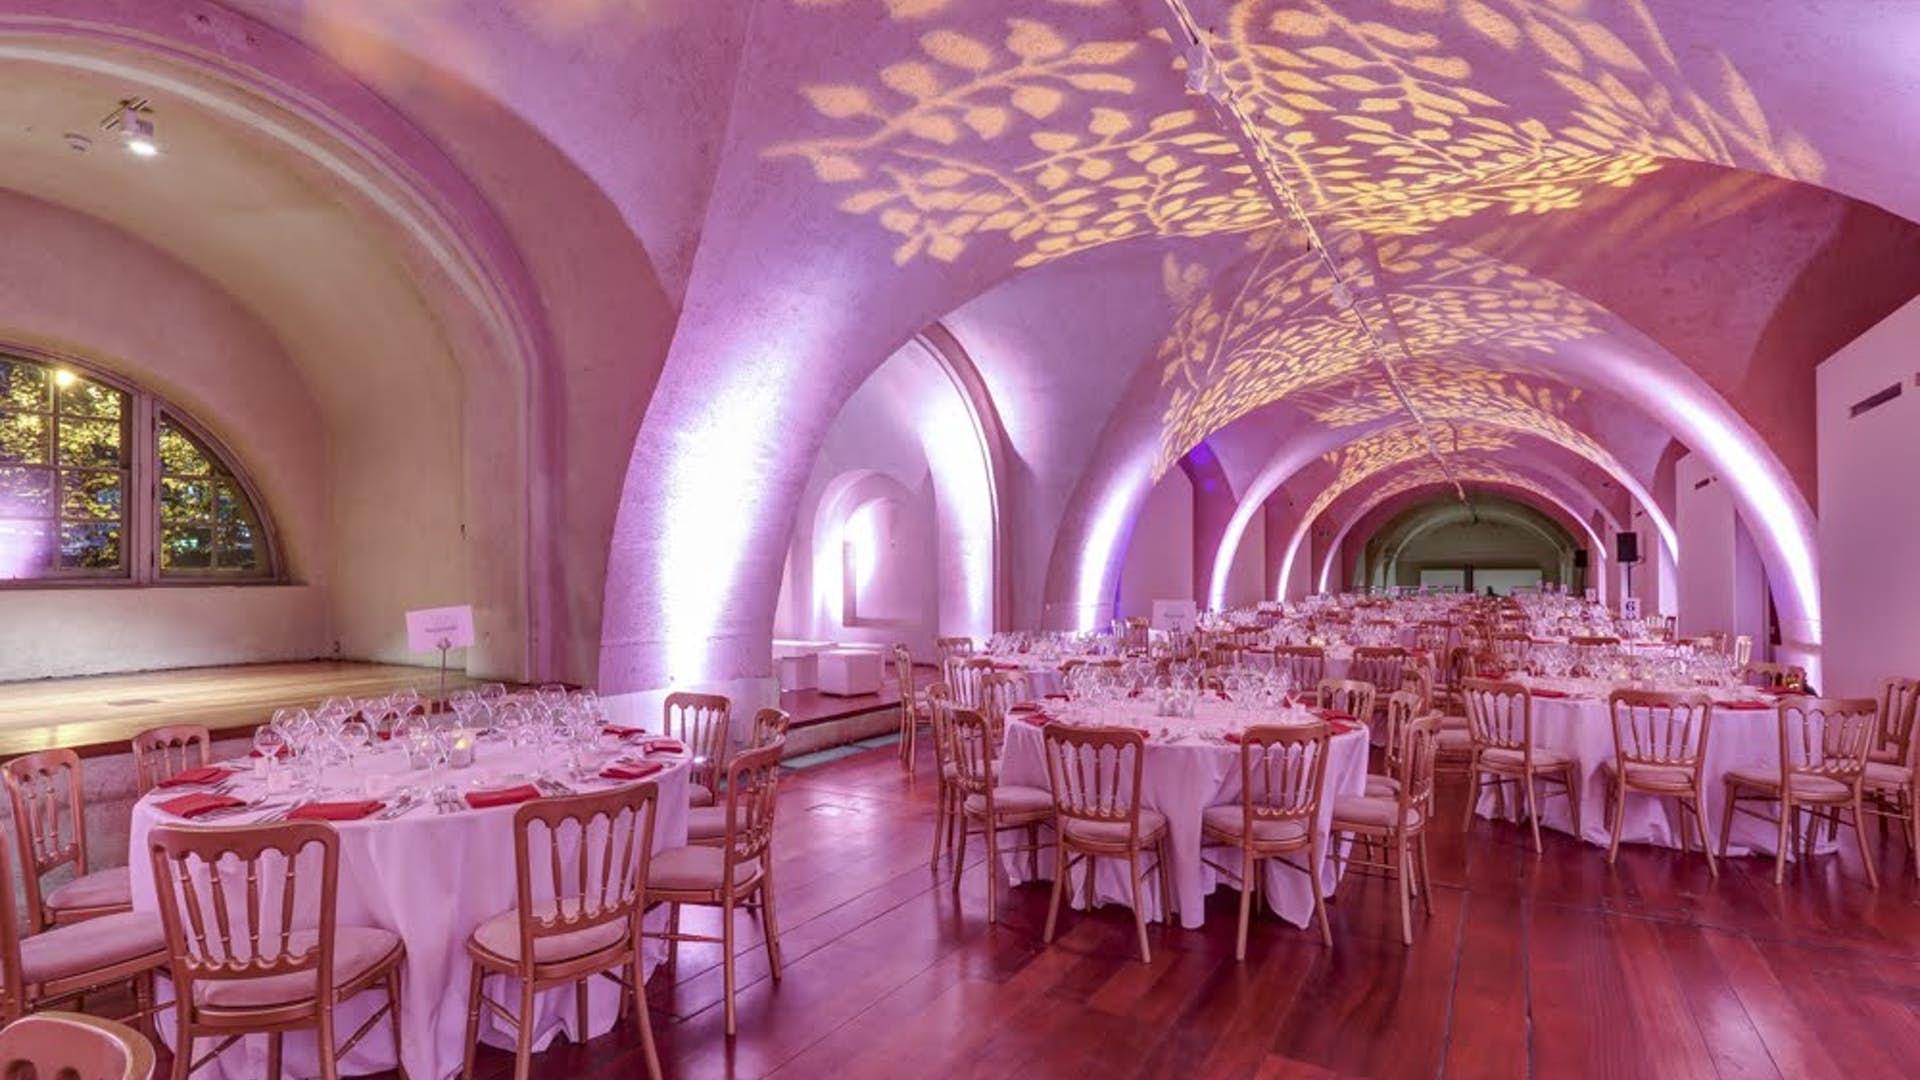 Embankment Gallery dining set up